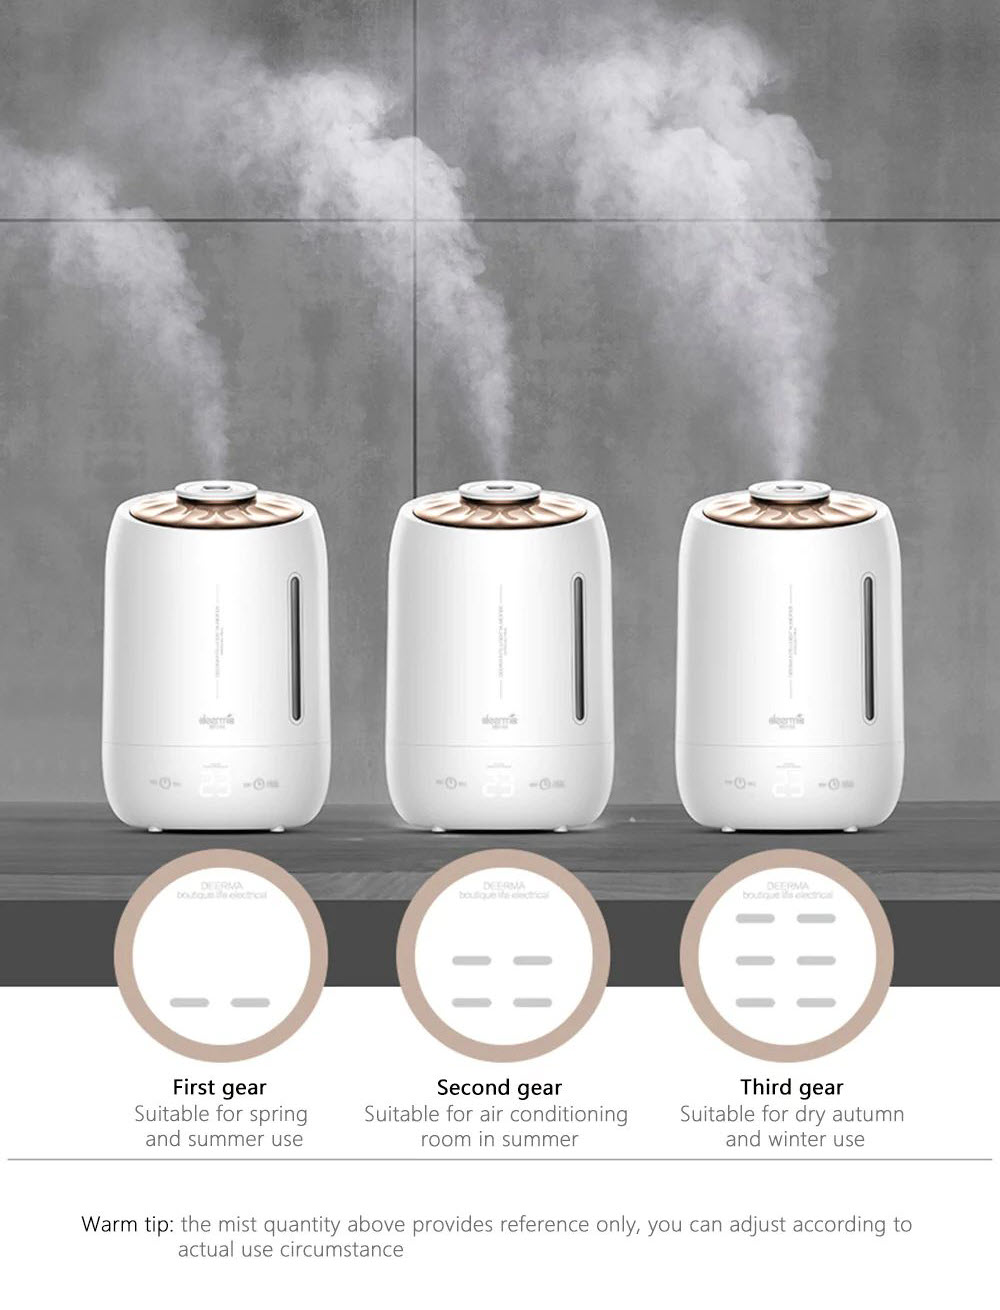 Xiaomi Deerma Dem F600 Household Humidifier Purifying Mist Maker 5l (5)